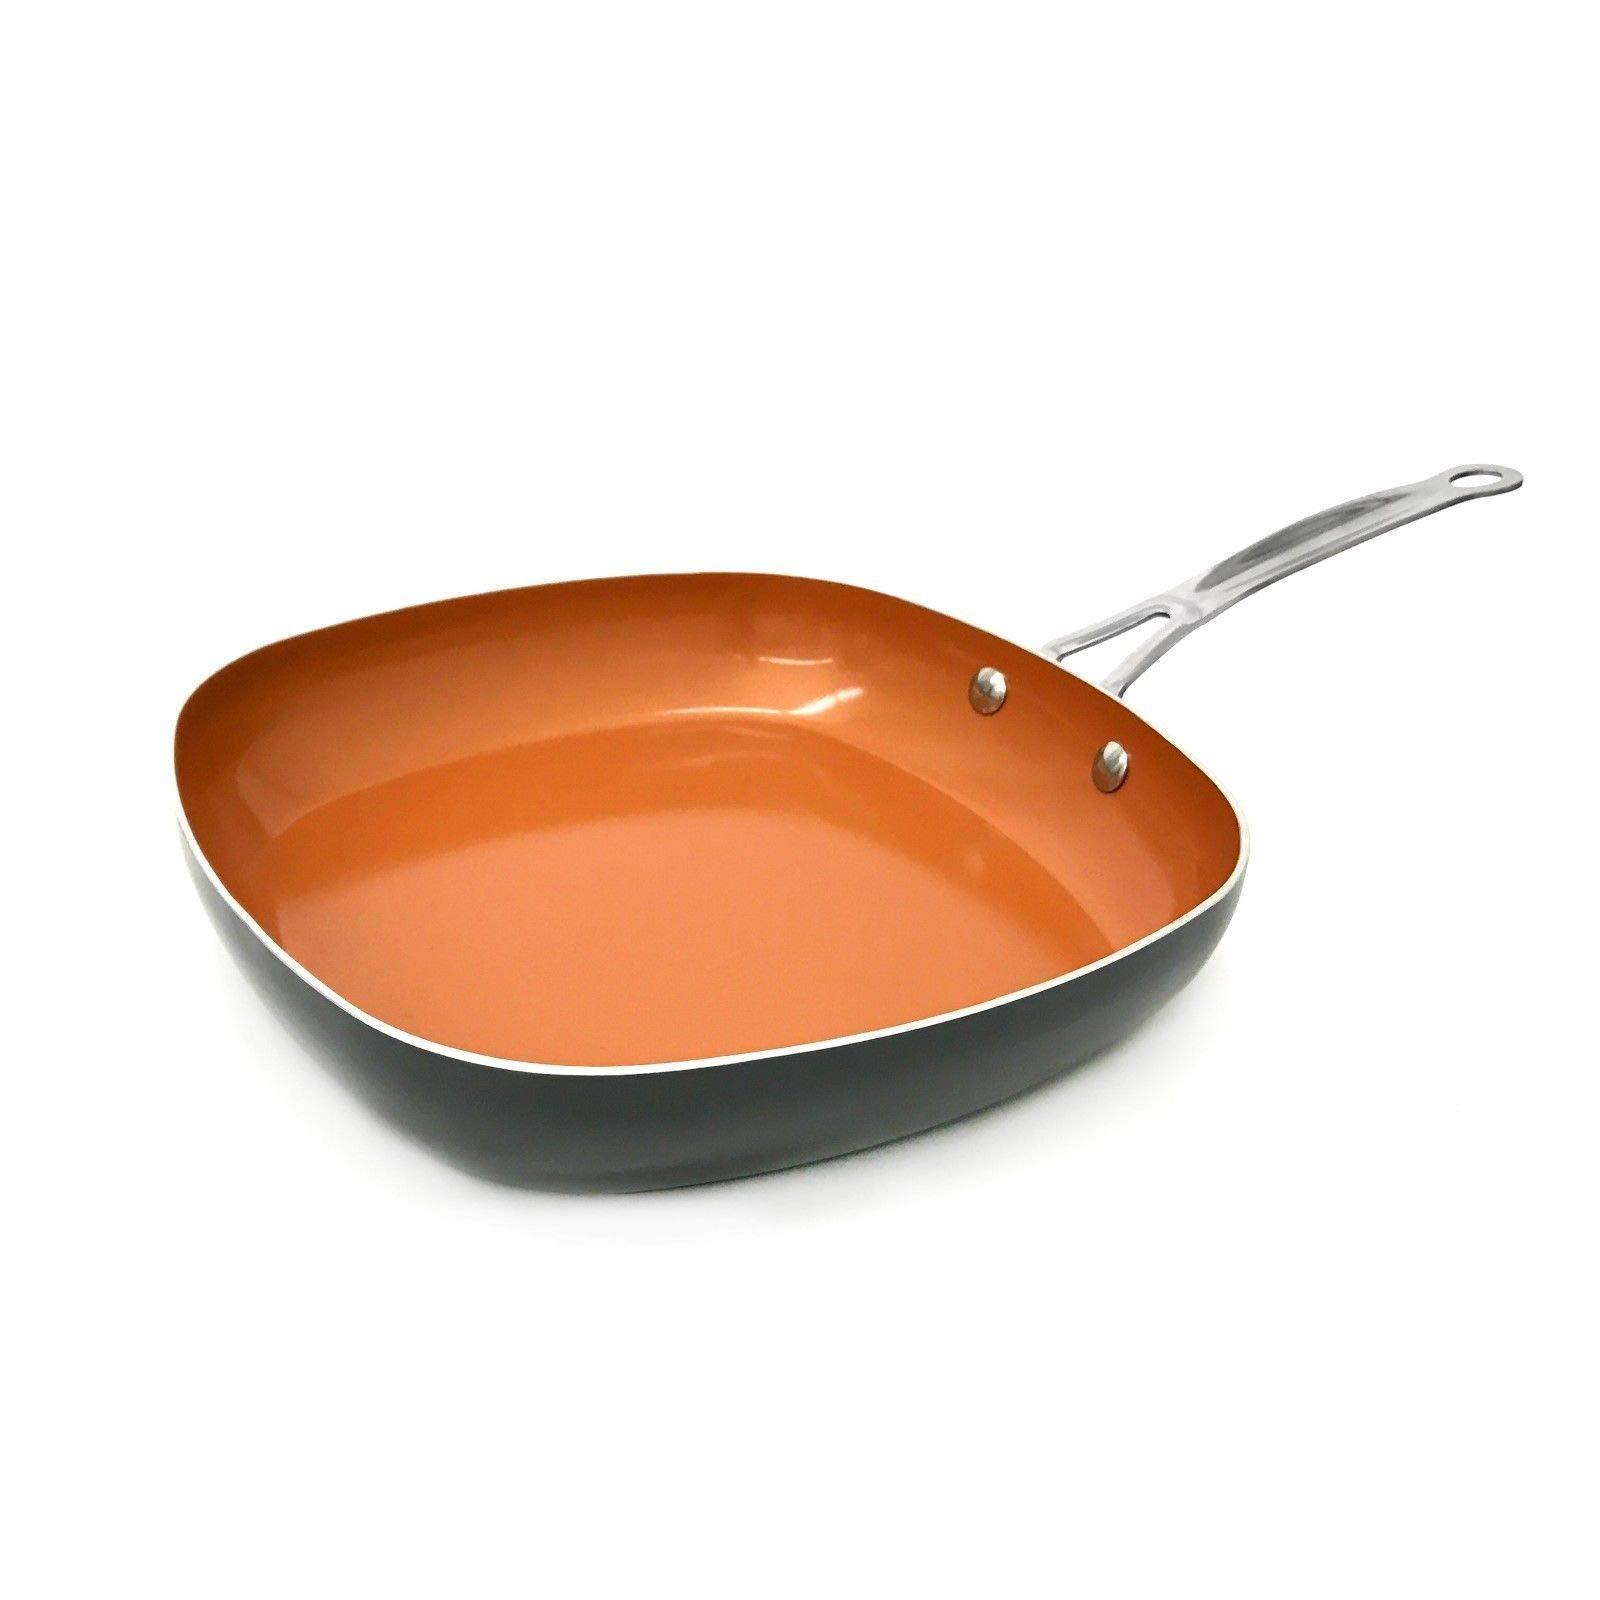 Gotham Steel 1735 Copper Square Shallow Pan with Super Nonstick Ti-Cerama Coating, 11 Inch